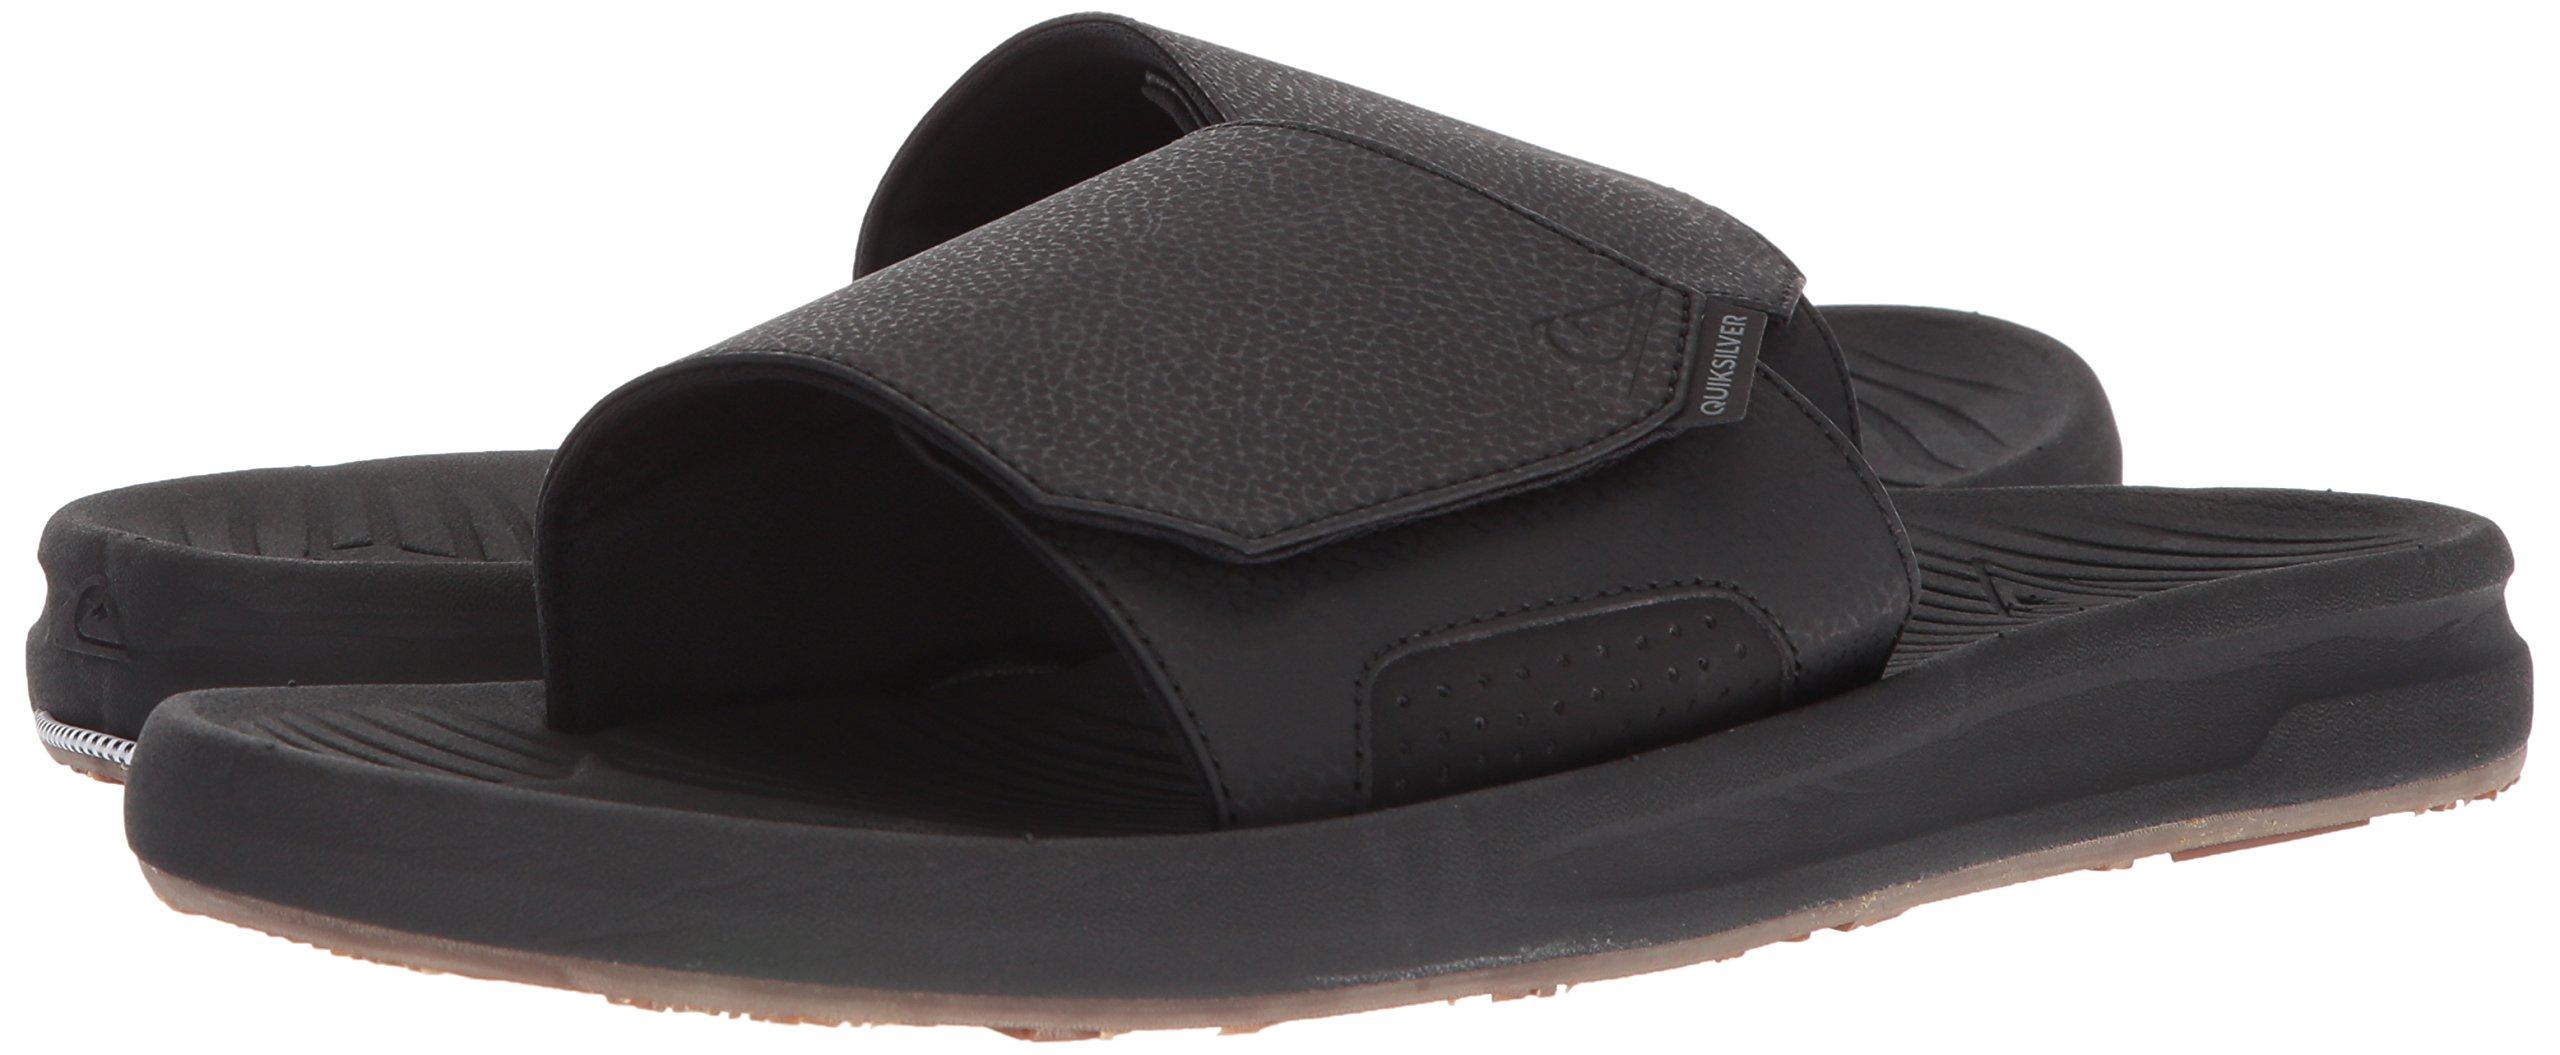 Quiksilver Men's Travel Oasis Slide Sandal, Black/Black/Brown, 8(41) M US by Quiksilver (Image #5)